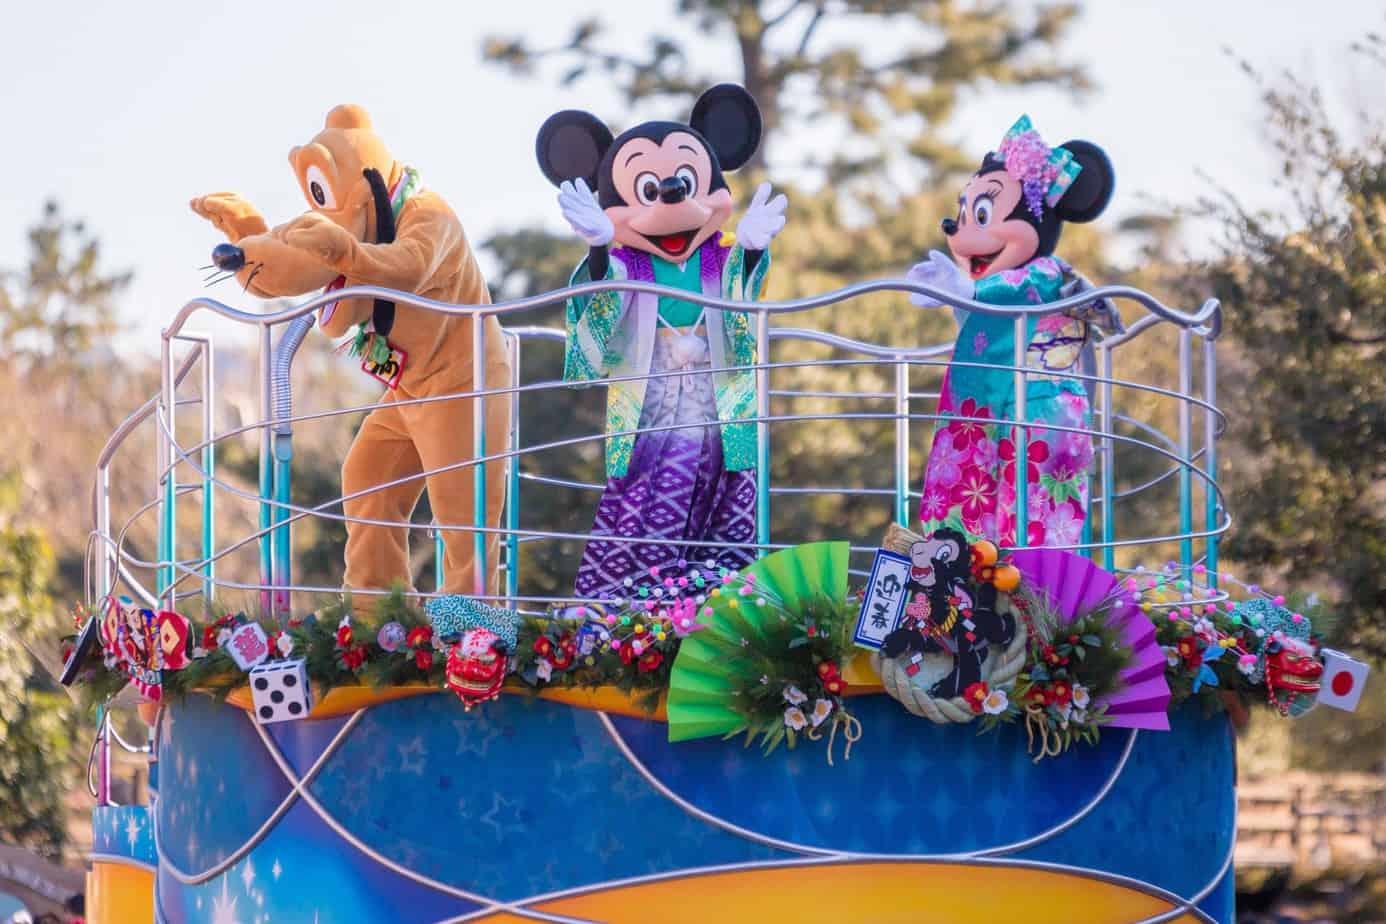 Pluto Mickey Minnie Tokyo Disneyland New Years Greeting 2015 Duy Phan Photography